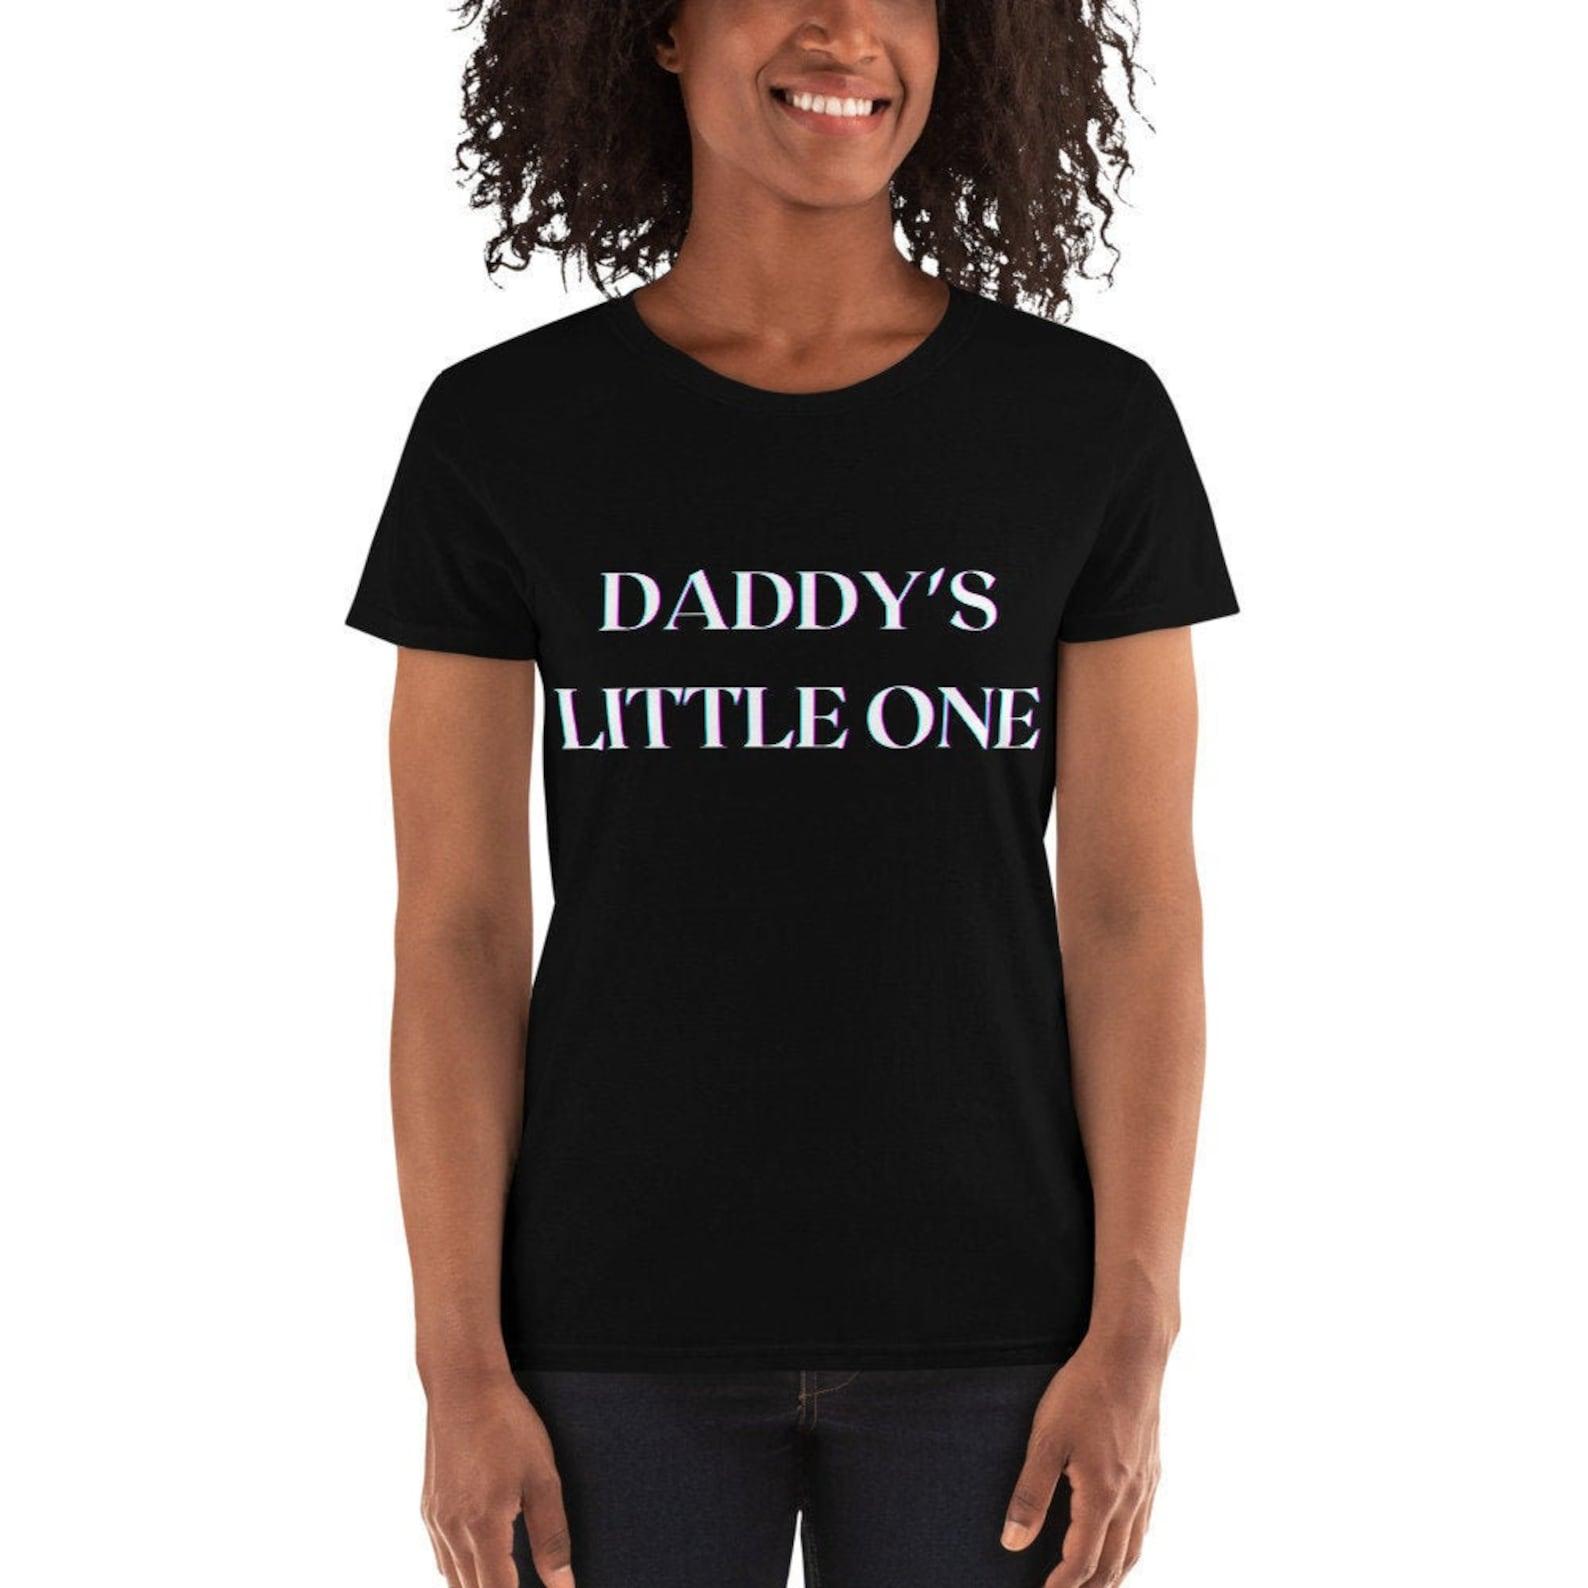 Papas kleine ein Hemd Ddlg Shirt Dom Sub-Tshirt Babygirl